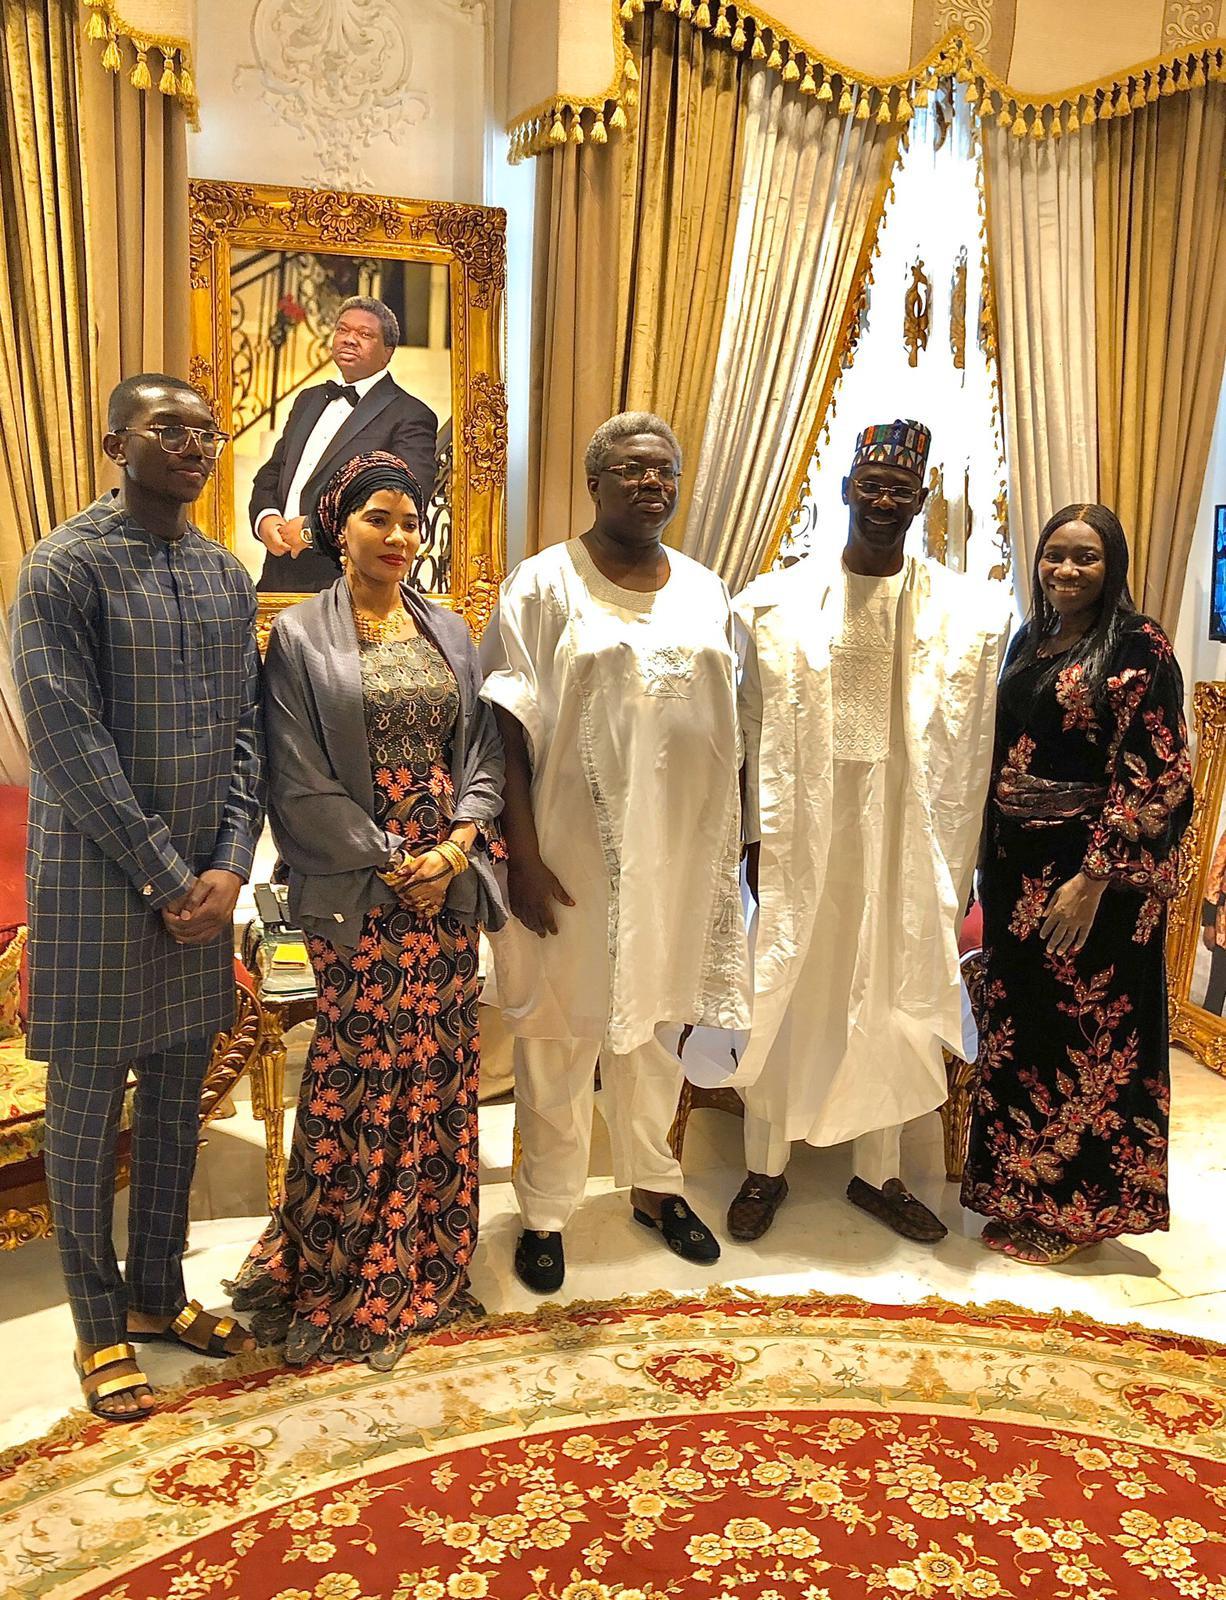 Sir Olu Okeowo receives Governor Abdullahi Sule of Nasarawa State at his palace